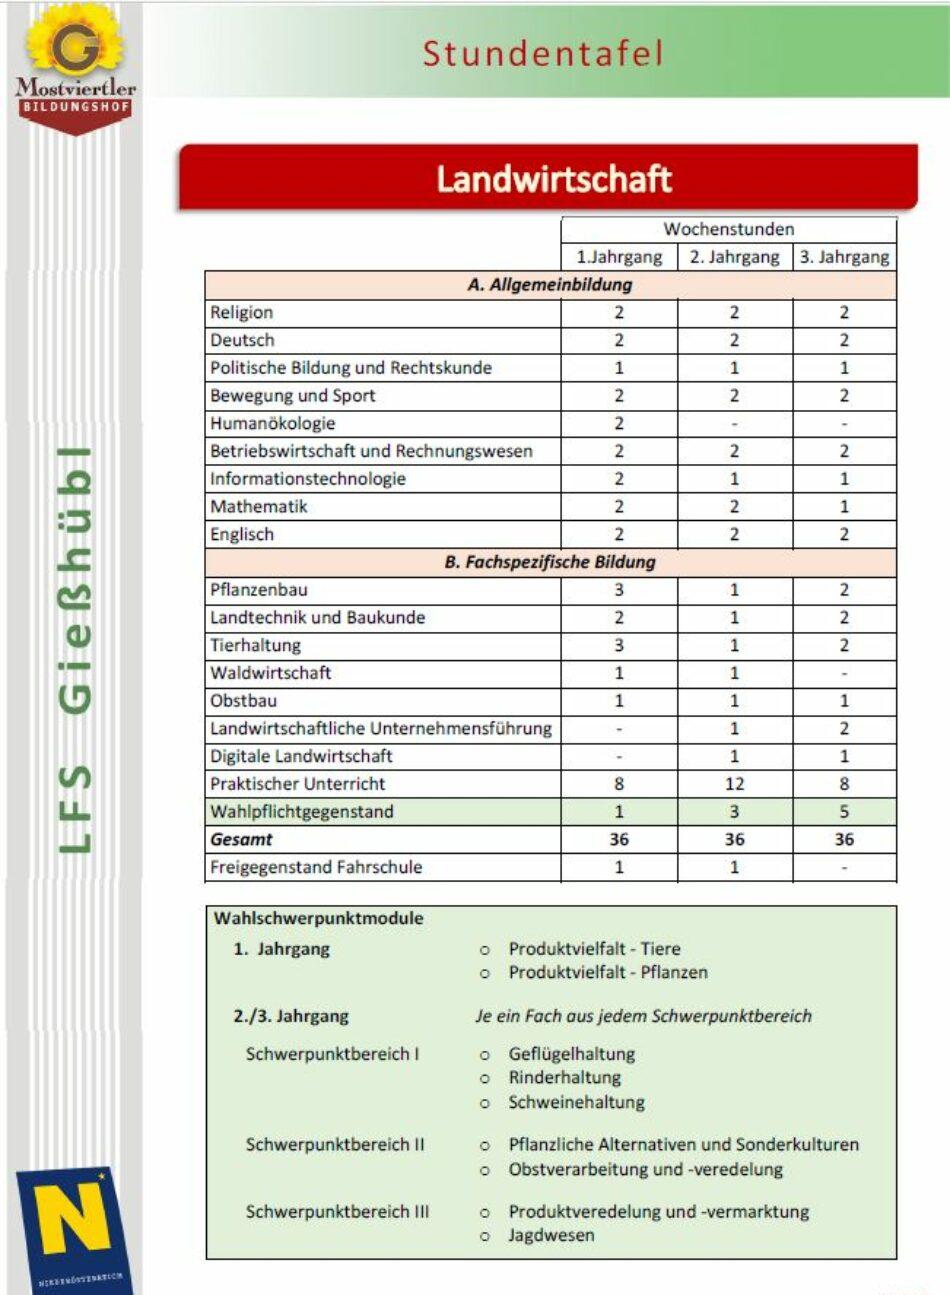 LW_Stundentafel